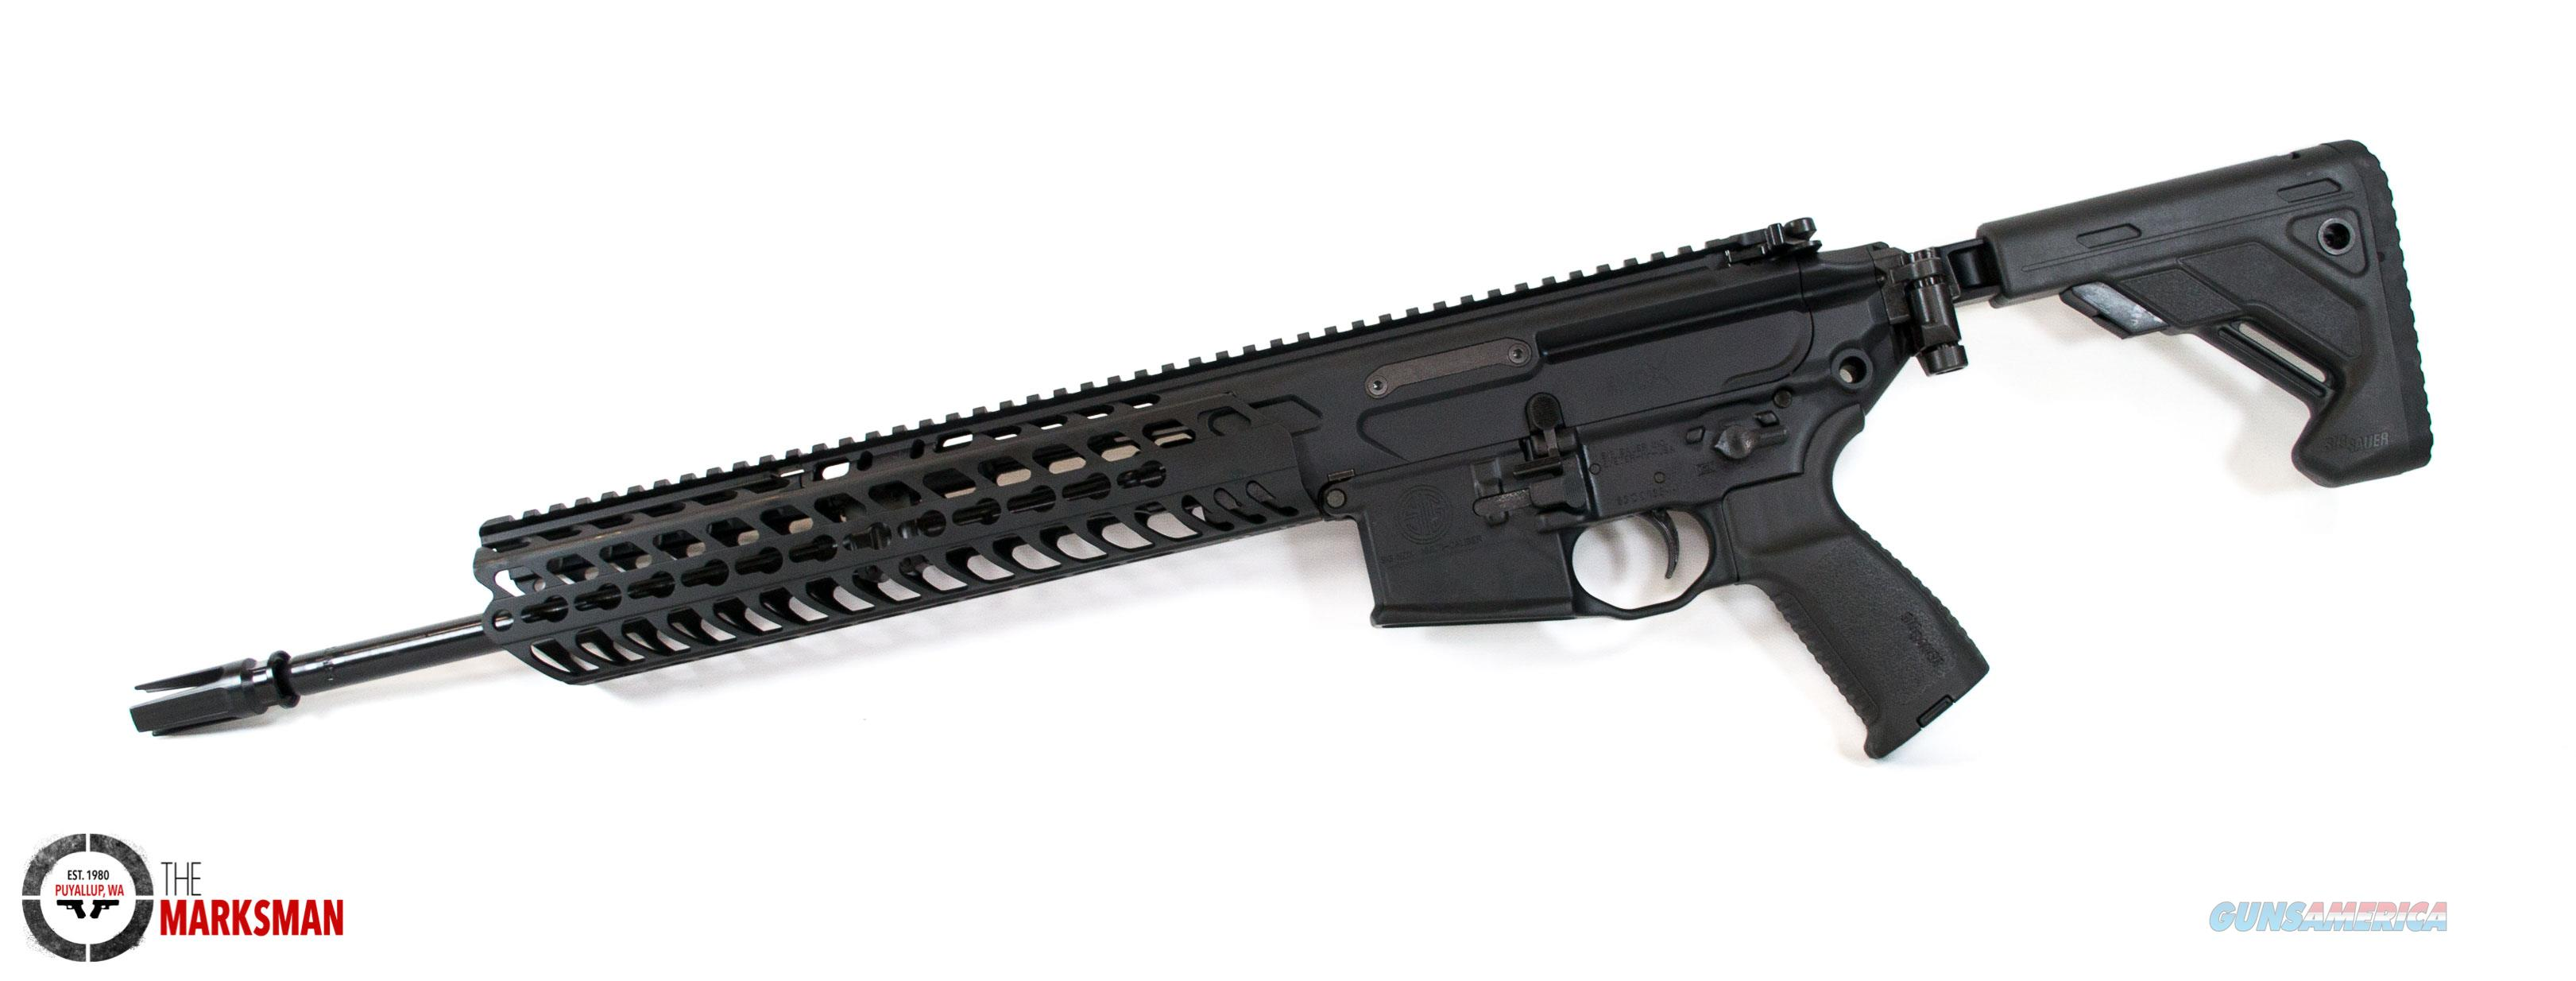 Sig Sauer MCX Patrol, 5.56mm NATO NEW Free Shipping and a ROMEO3 Red Dot Sight  Guns > Rifles > Sig - Sauer/Sigarms Rifles